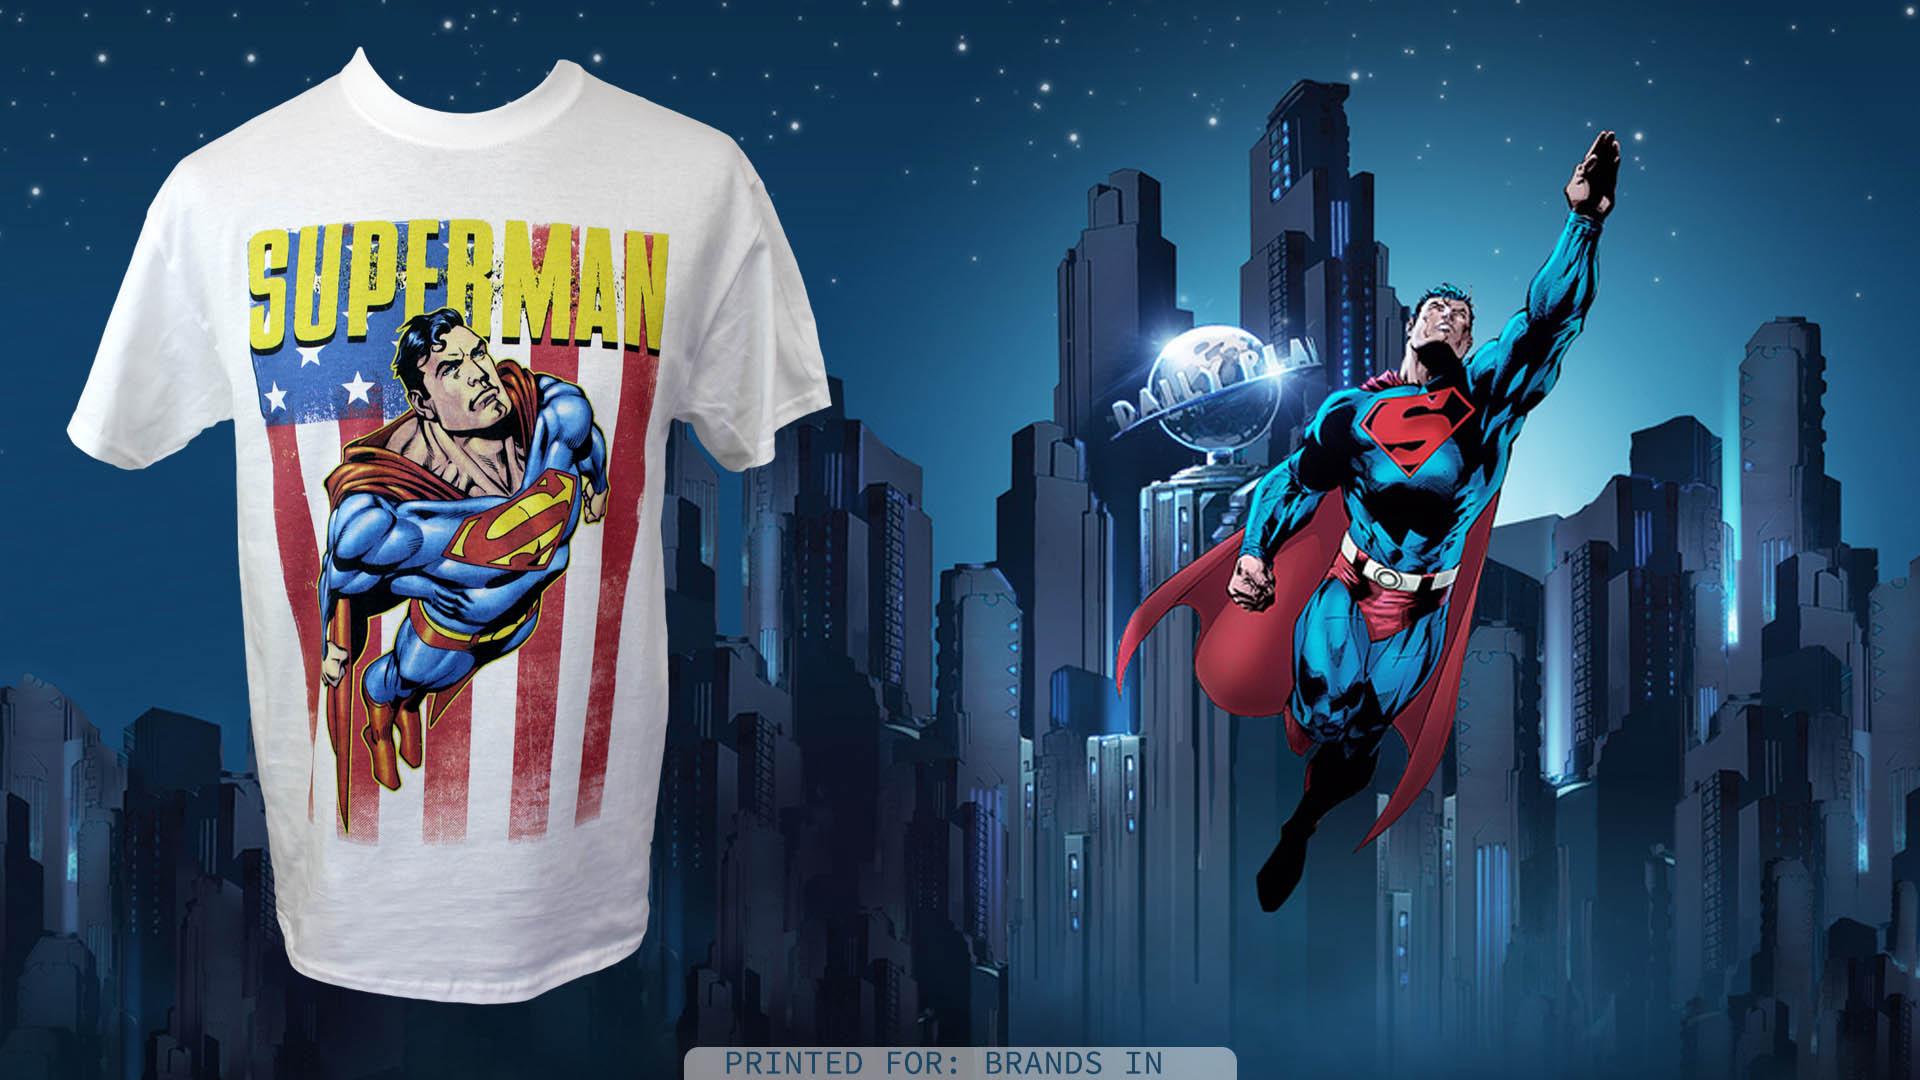 Dtg printing superman t shirt printing fresh air ltd for Dtg t shirt printing company